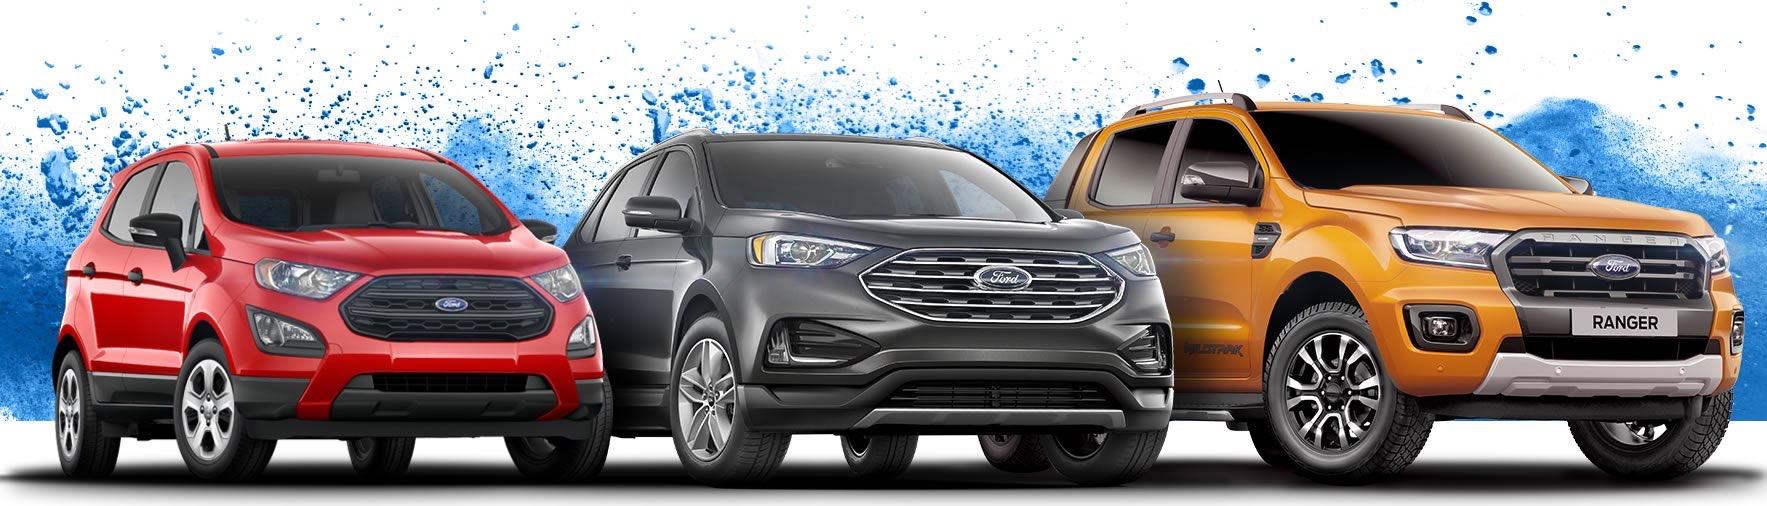 Modelos Ford Guatemala